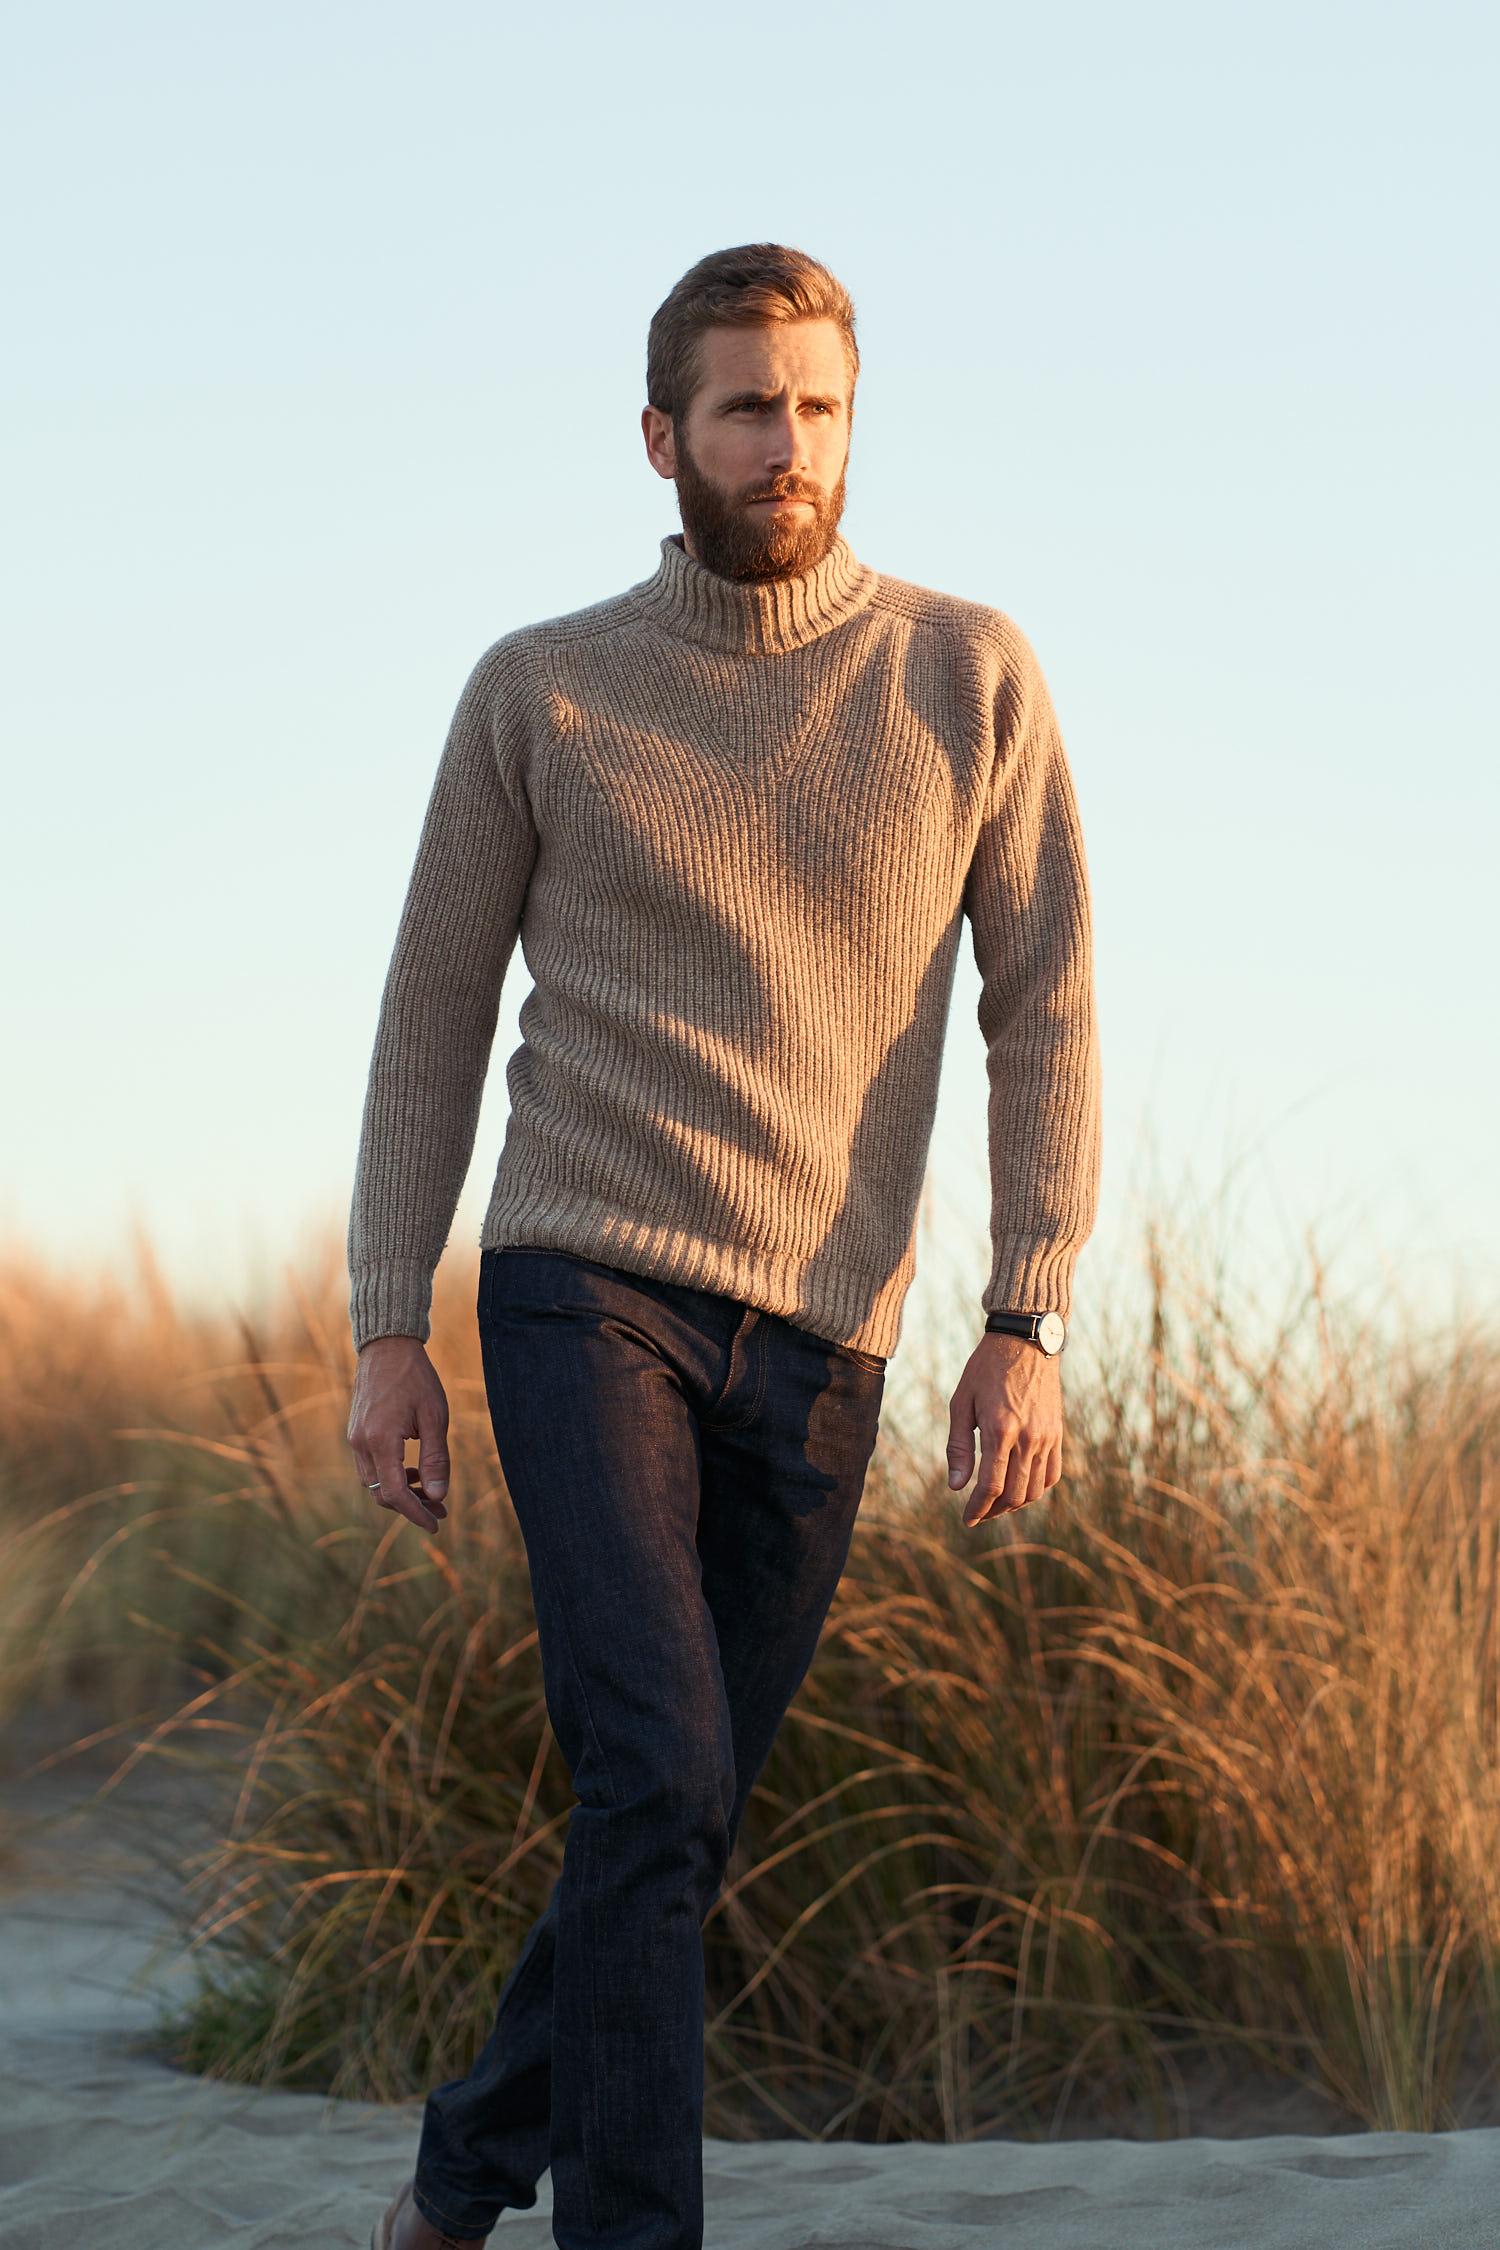 Pull-over 100% laine de Mérinos d'Arles, tricoté en France dans le Tarn. Made In France